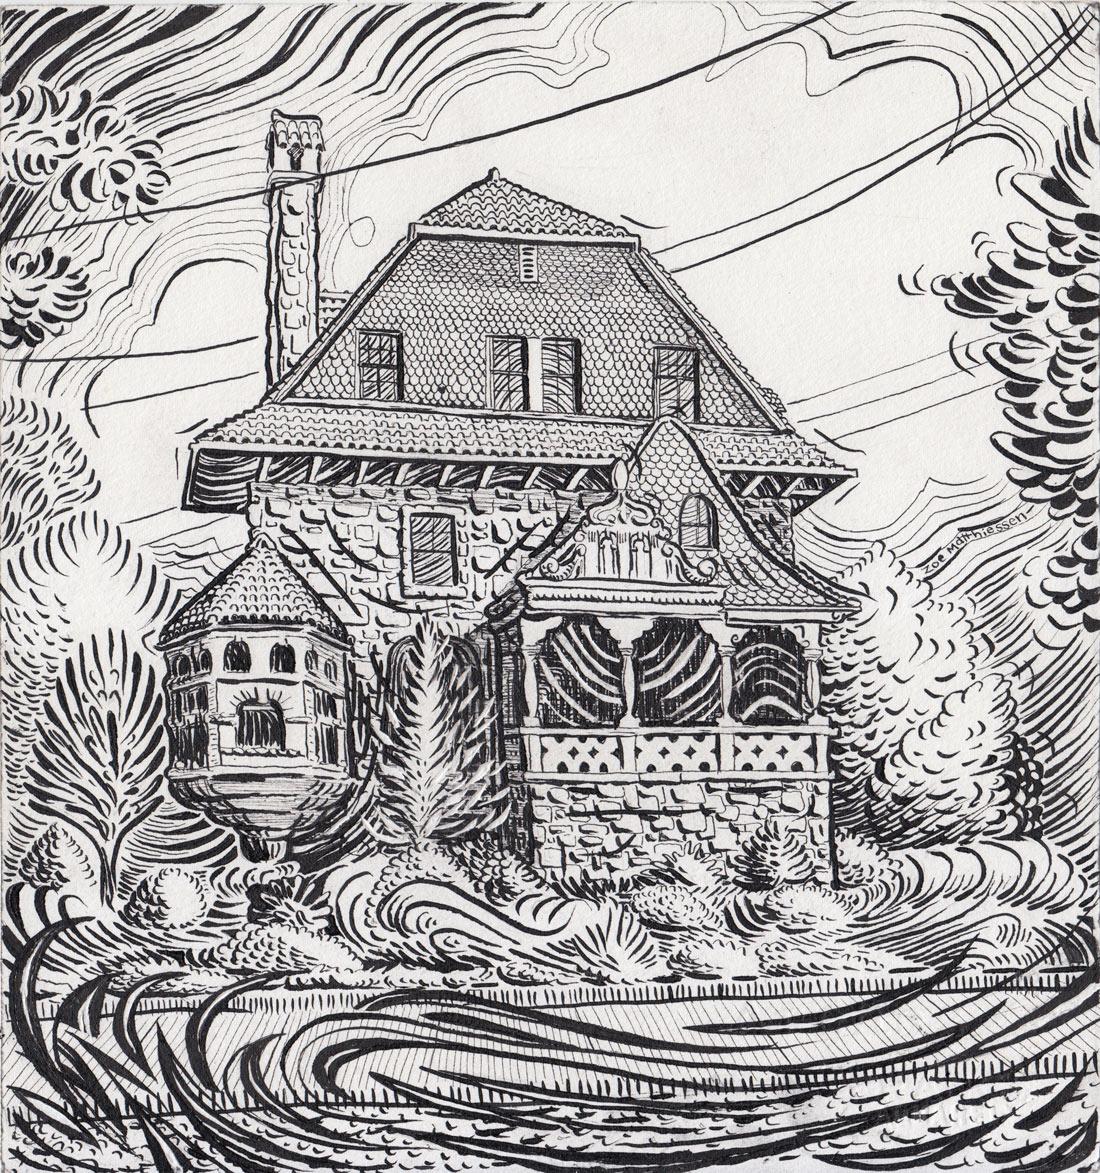 Hillhouse Dream House